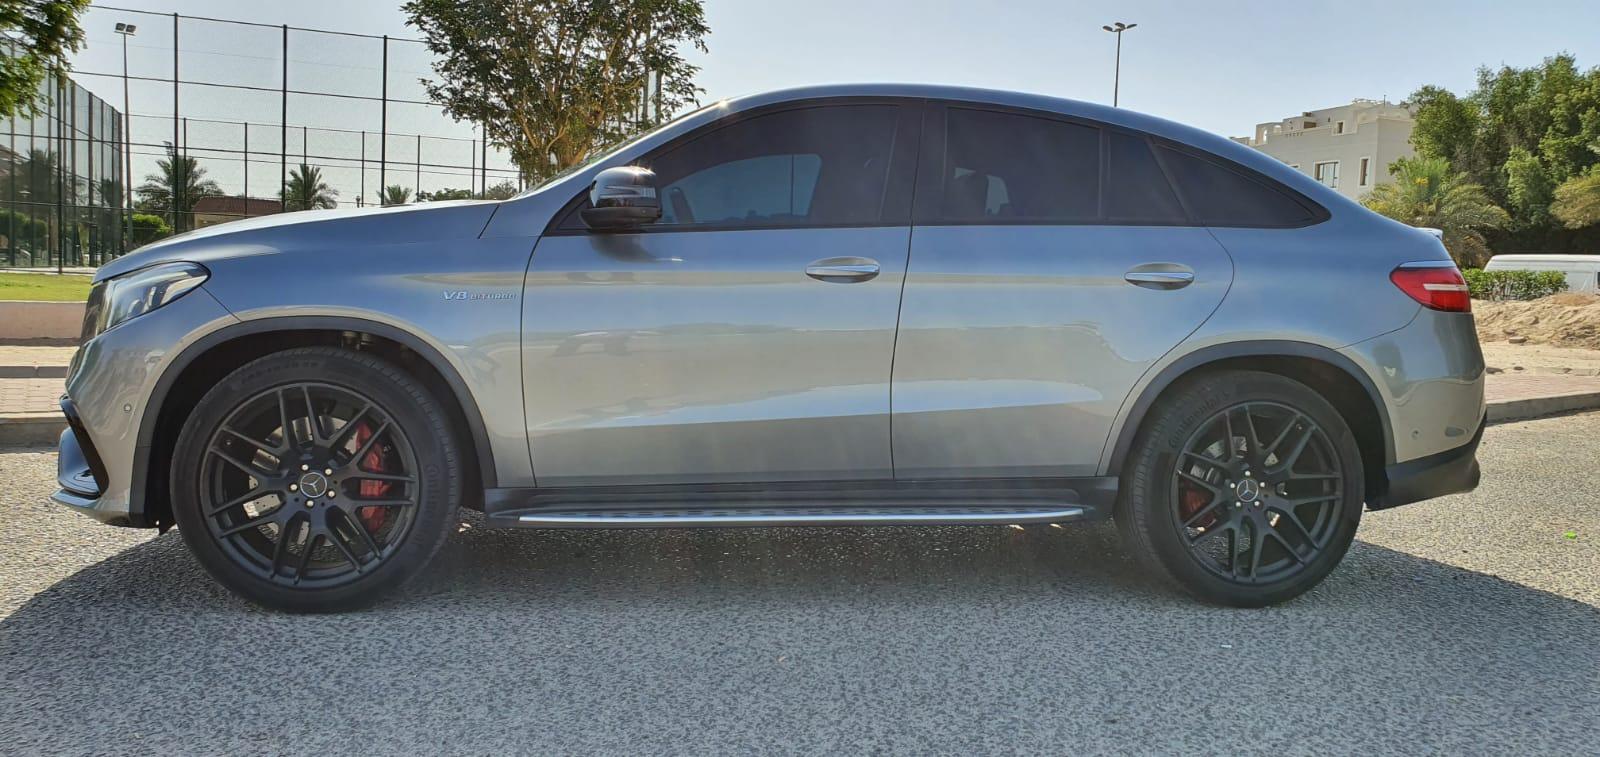 Mercedes-Benz GLE 63 AMG S 2016